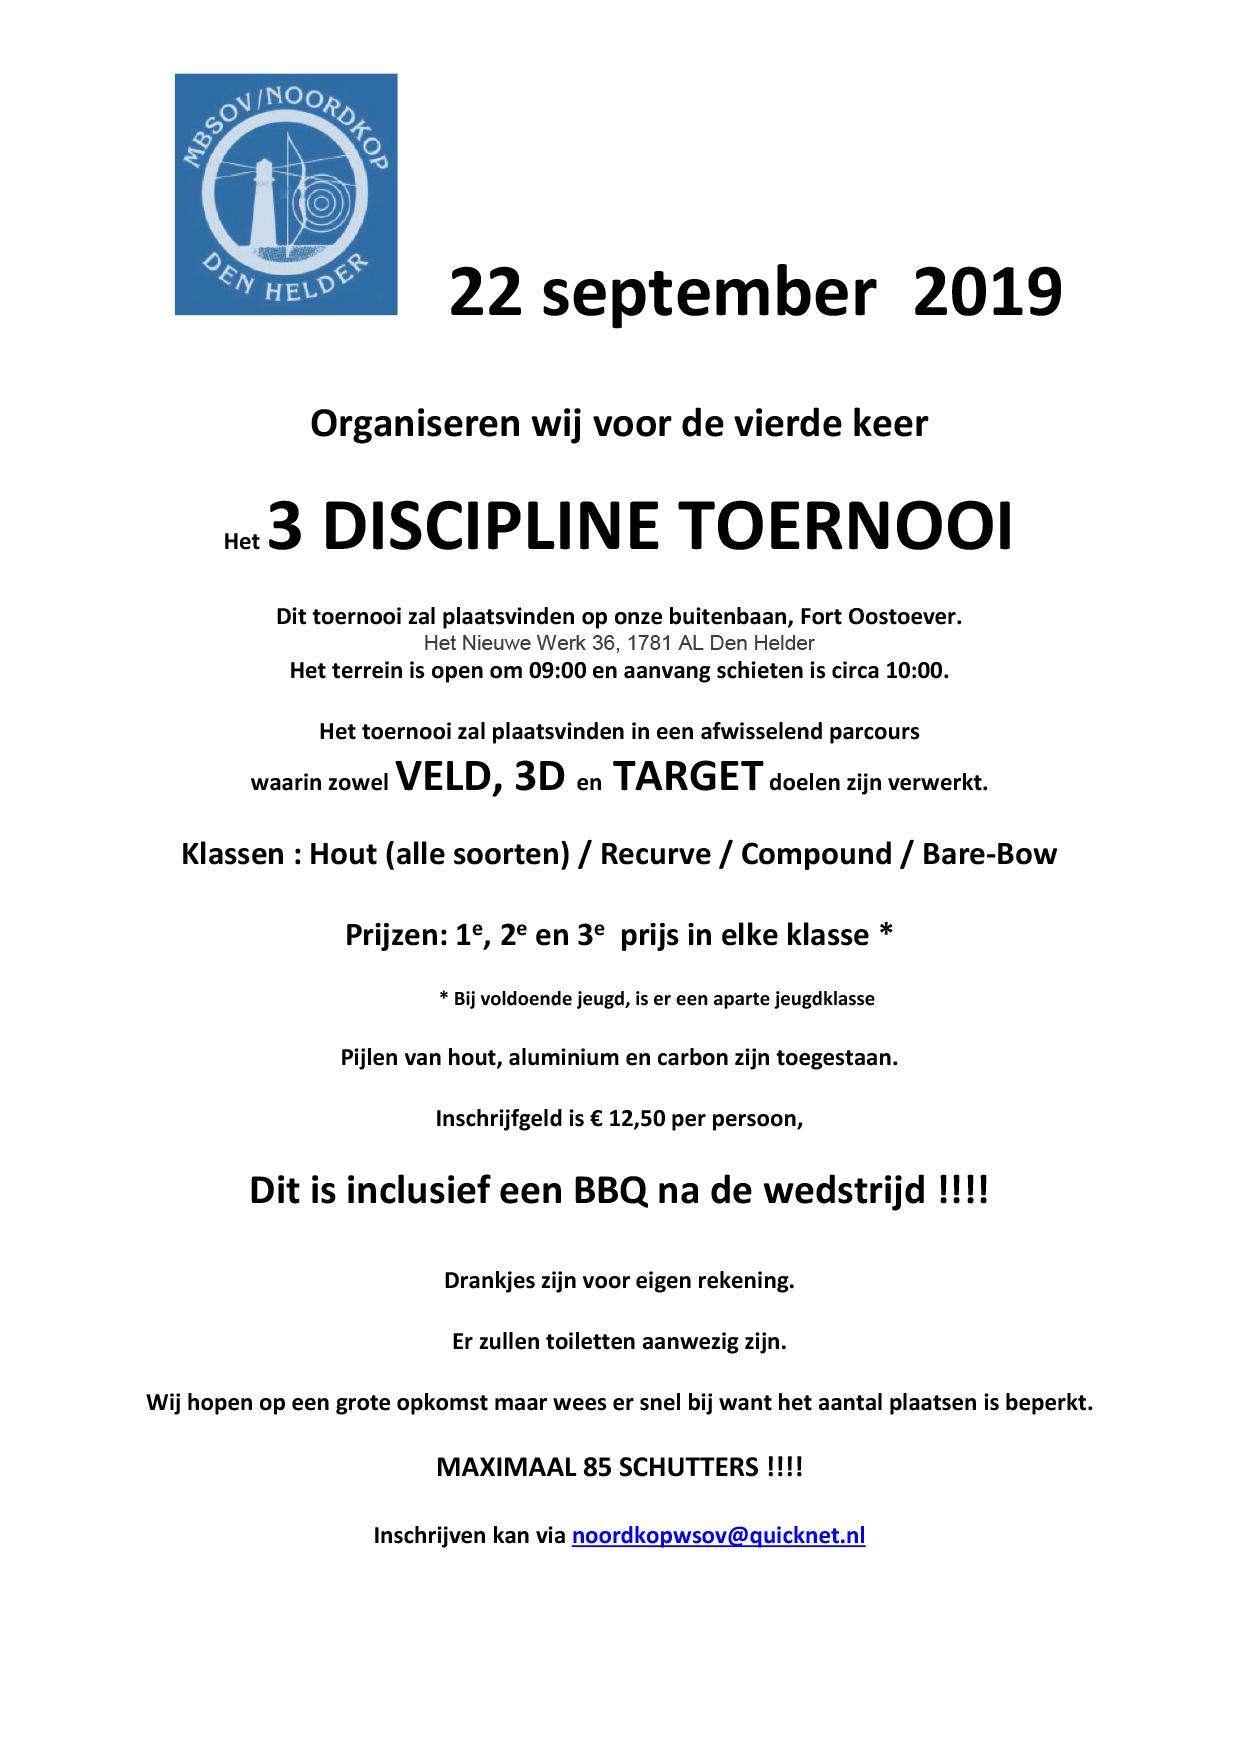 UITNODIGING-3-discipline-toernooi-2019